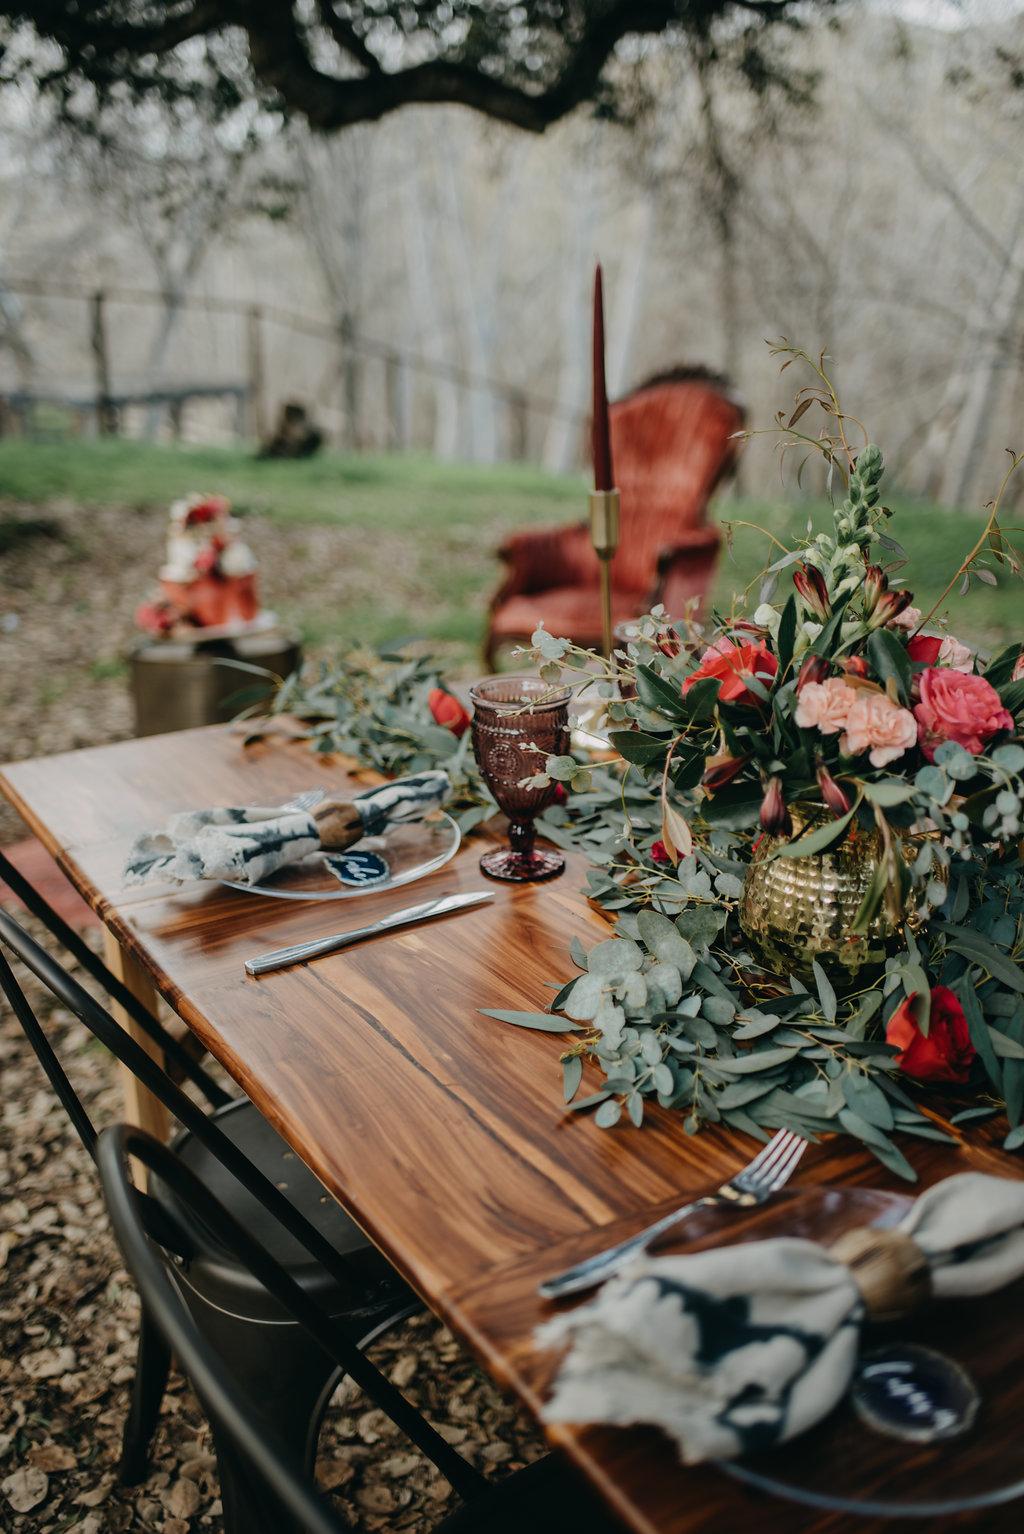 bohemian wedding decor natural outdoors fall wedding decor floral centerpiece rustic wedding